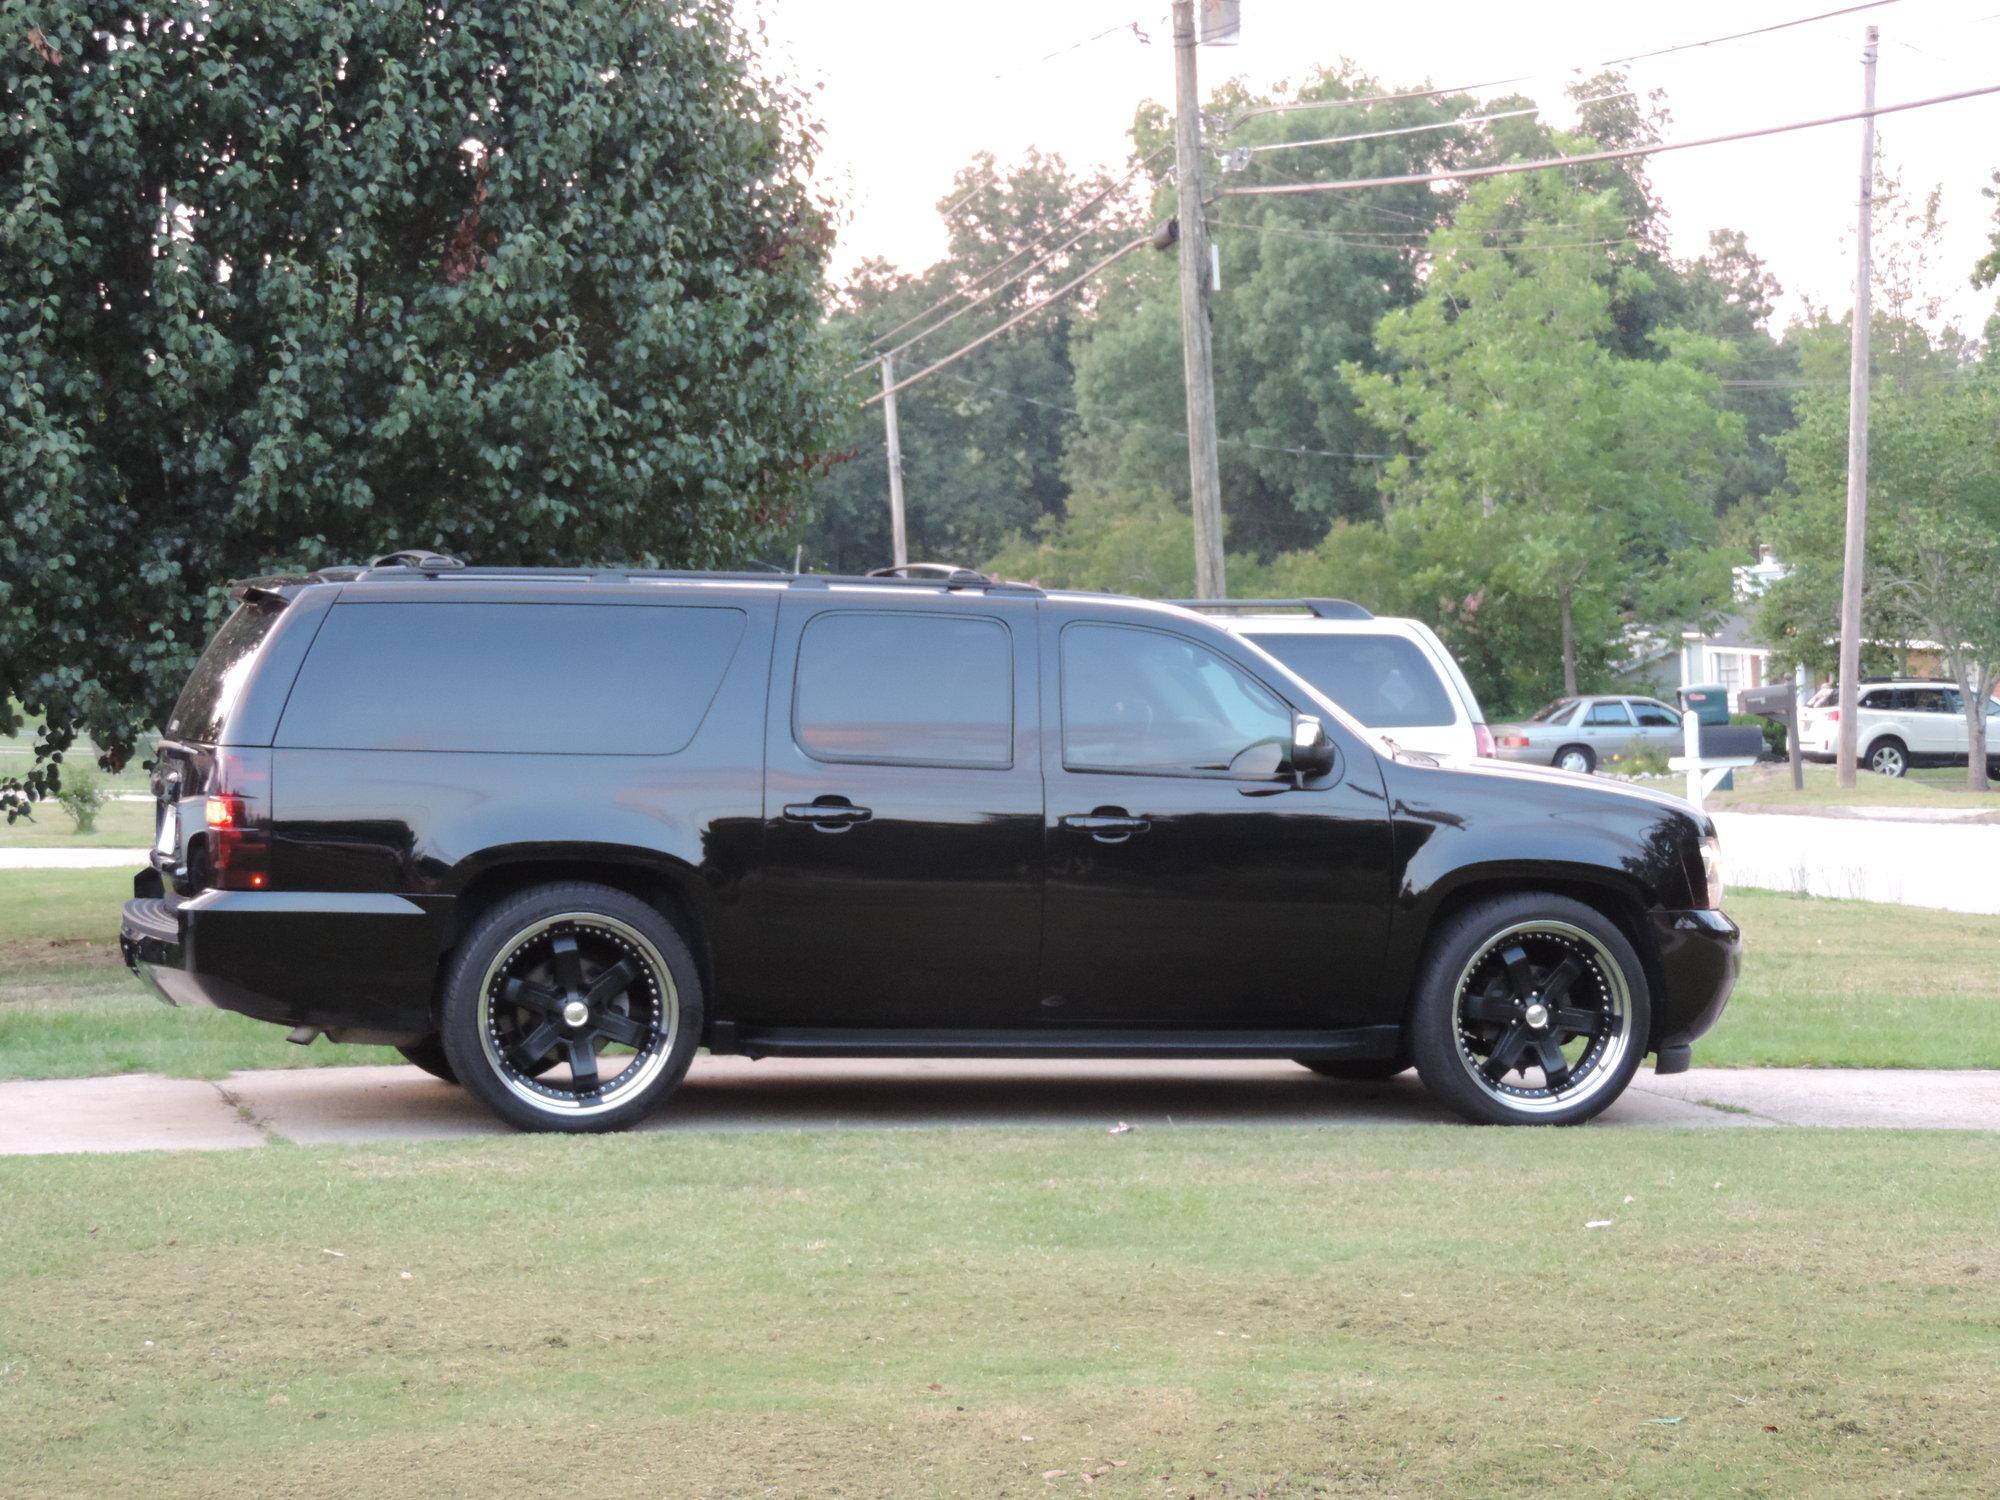 Blacked out 2008 Suburban LTZ - Chevrolet Forum - Chevy ...